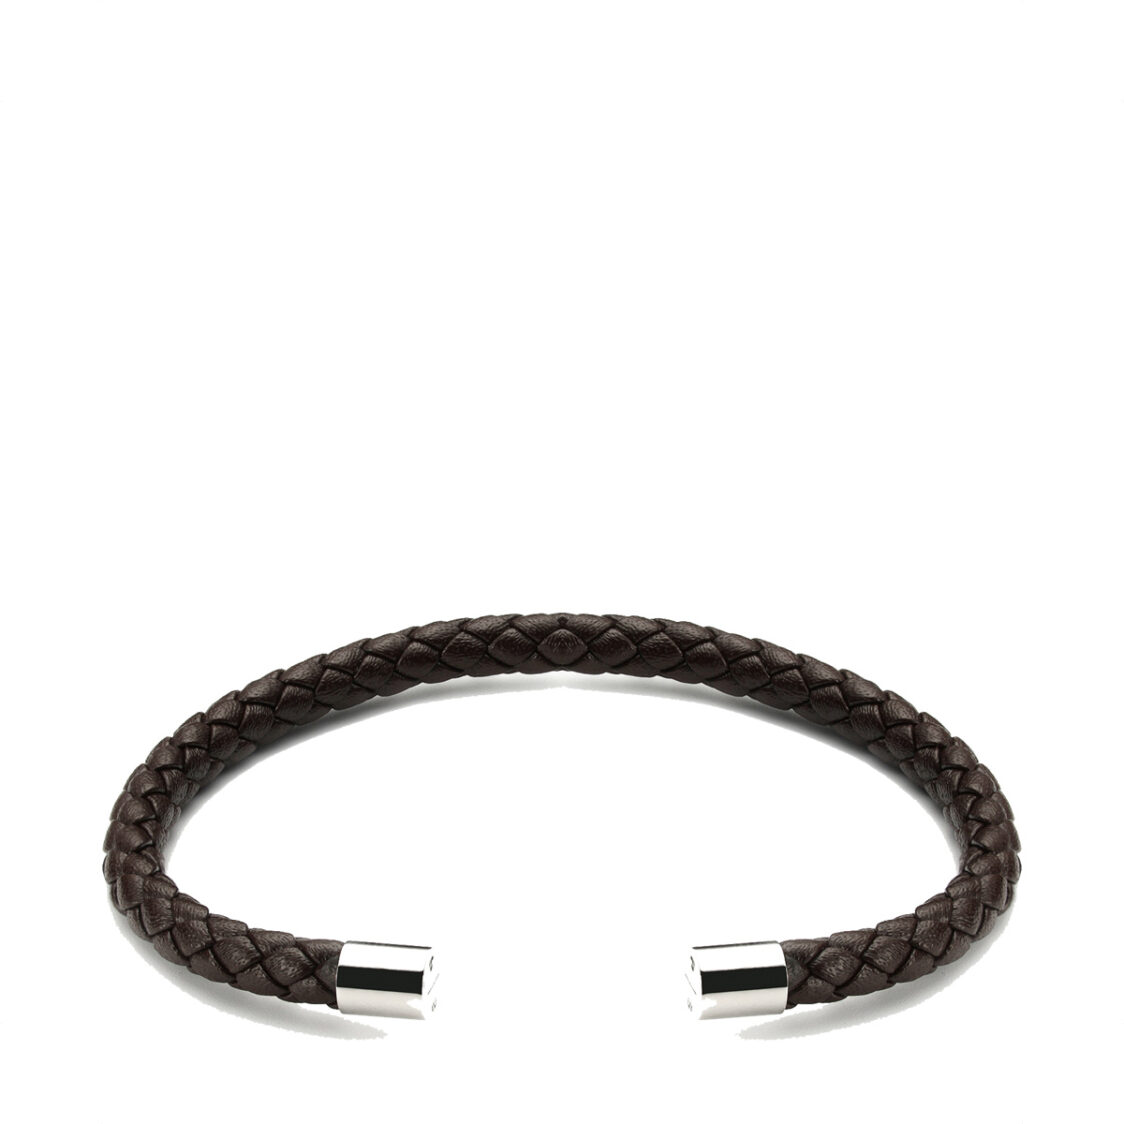 Plain Supplies Wve Cuff - Brown Leather